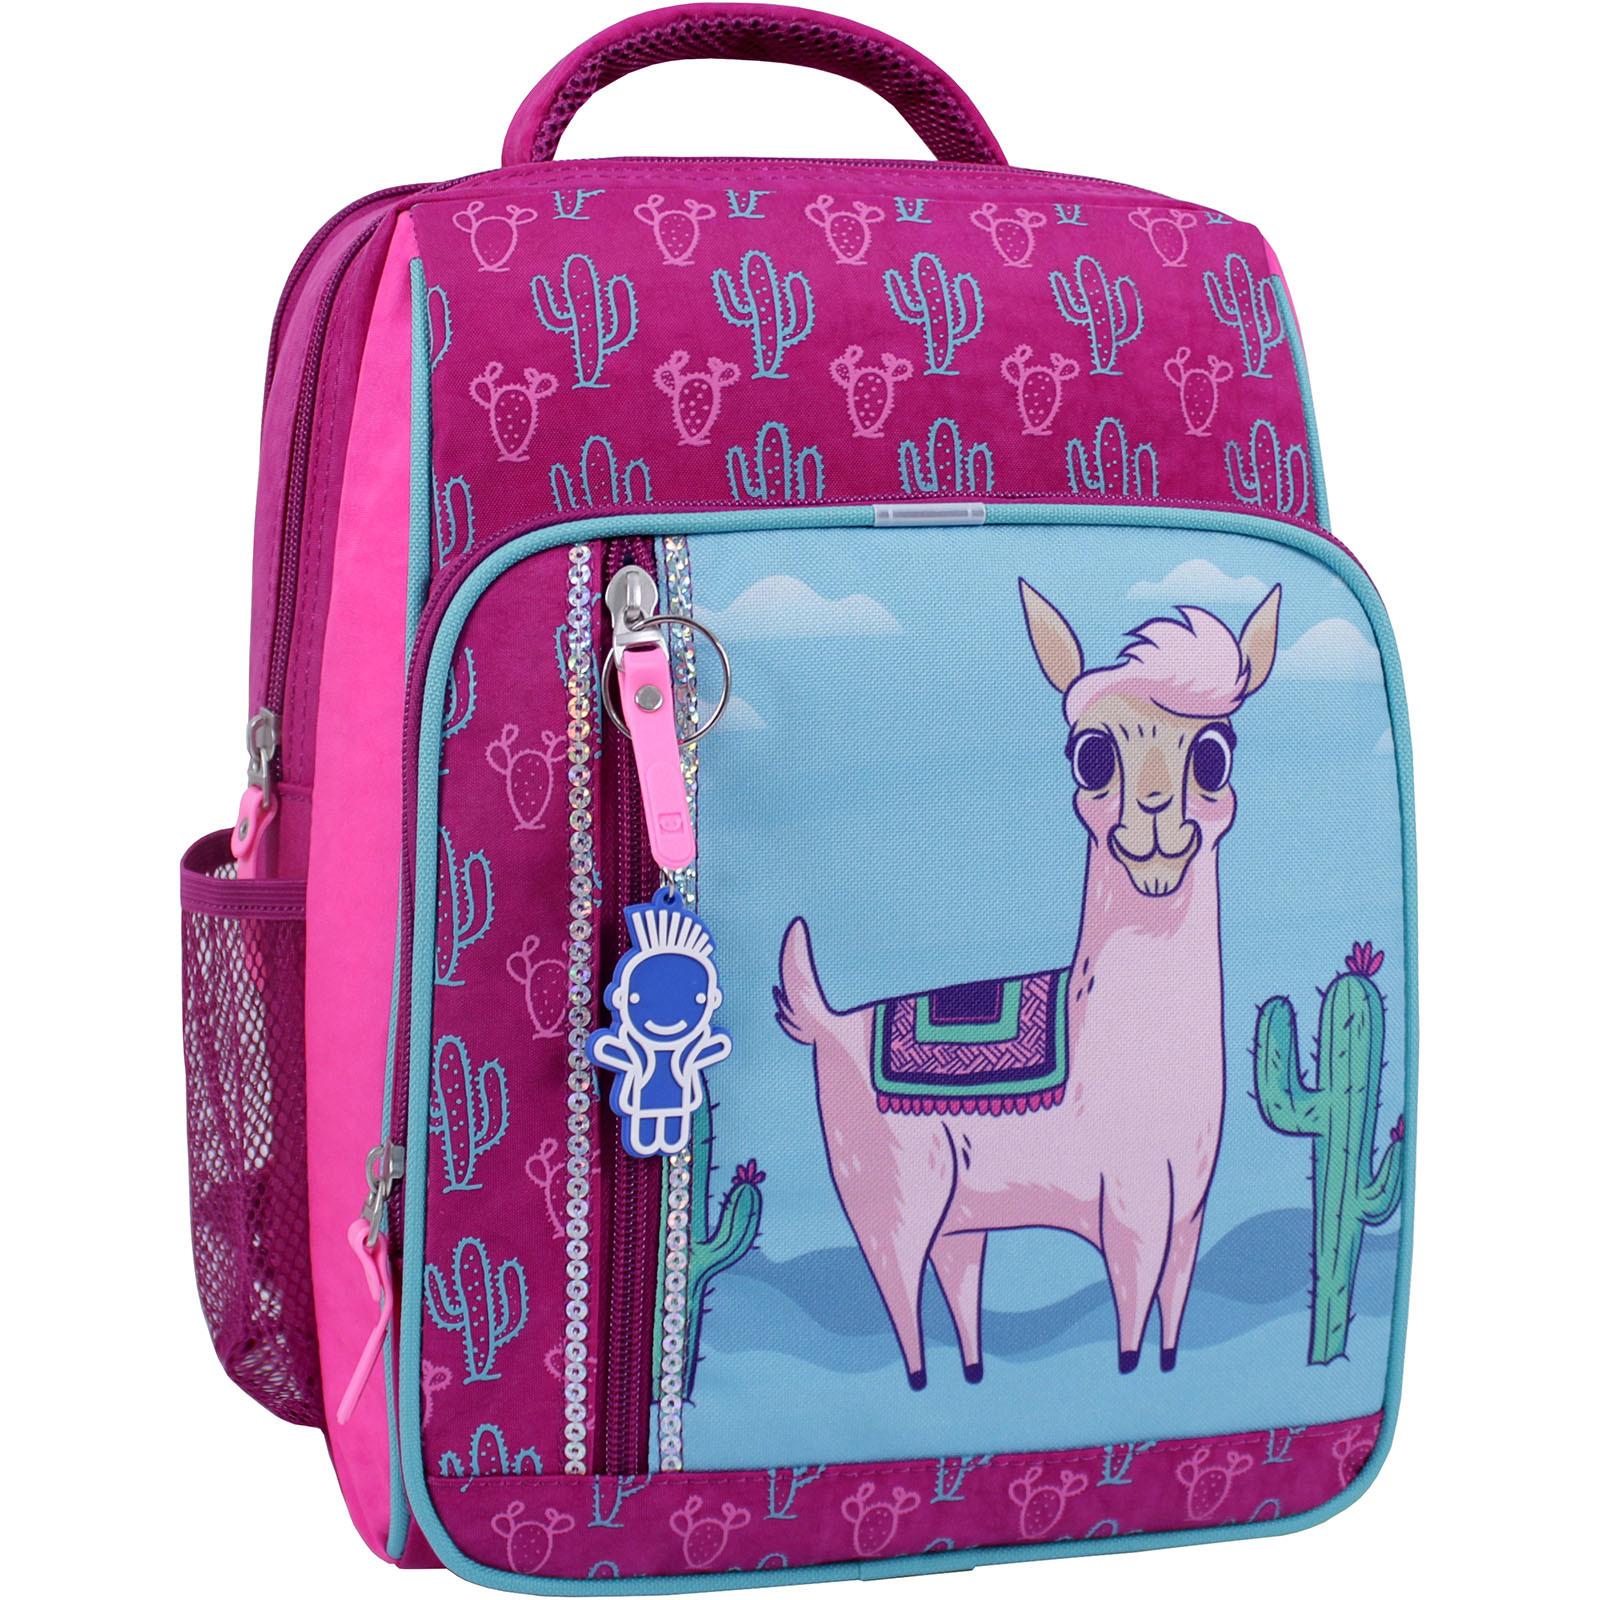 Школьные рюкзаки Рюкзак школьный Bagland Школьник 8 л. малиновый 617 (0012870) IMG_1053_суб.617_.JPG